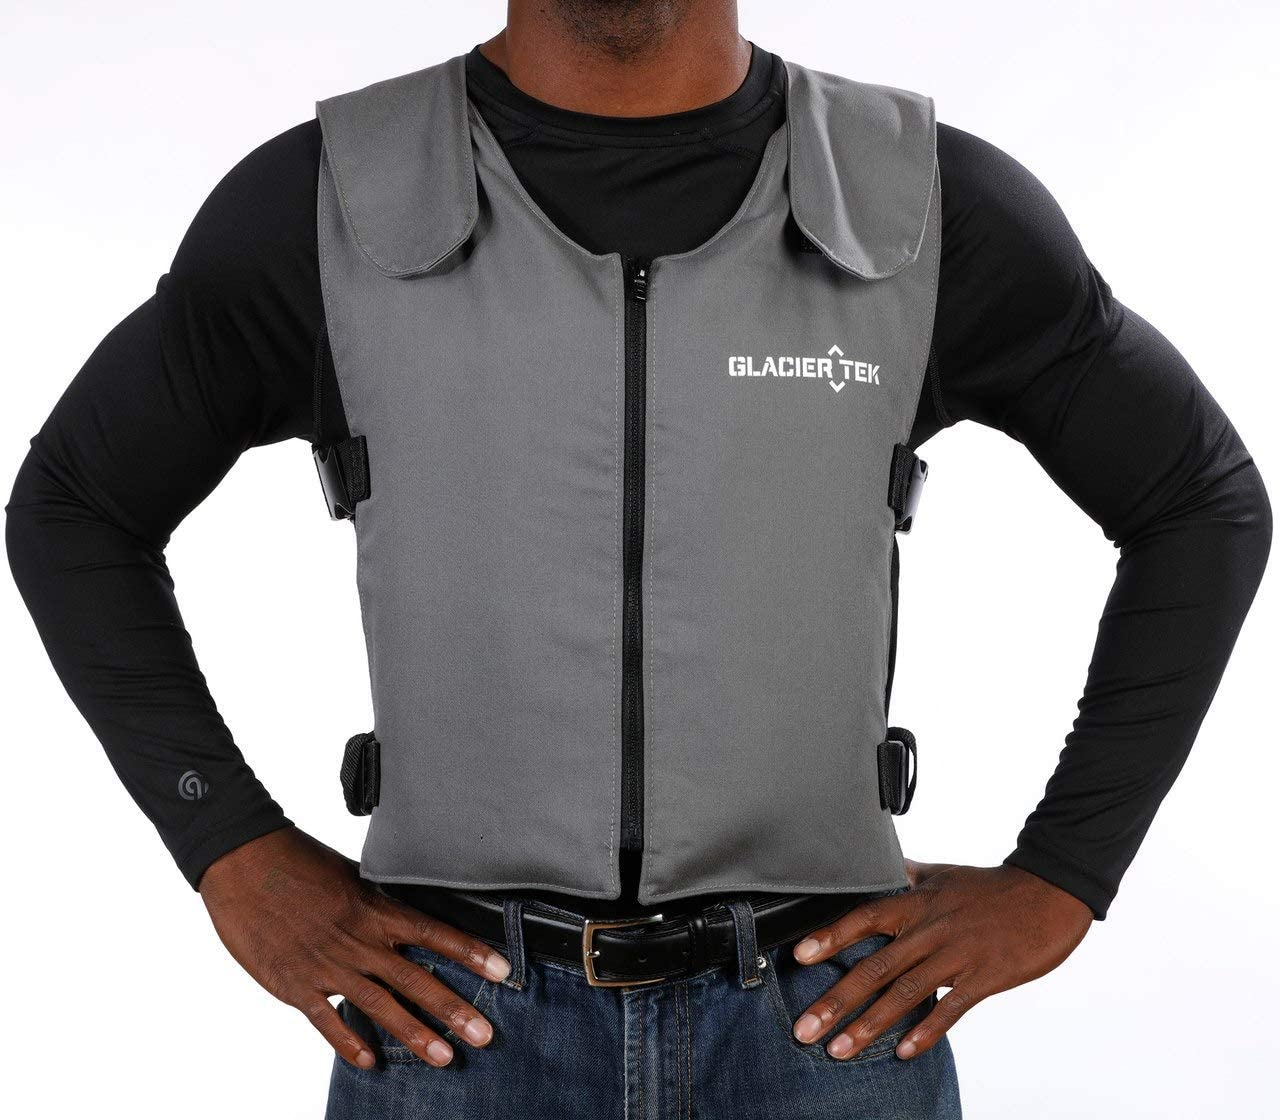 Glacier Tek Original Cool Vest with FR3 Flame-Retardant Banox Fabric and Nontoxic Cooling Packs